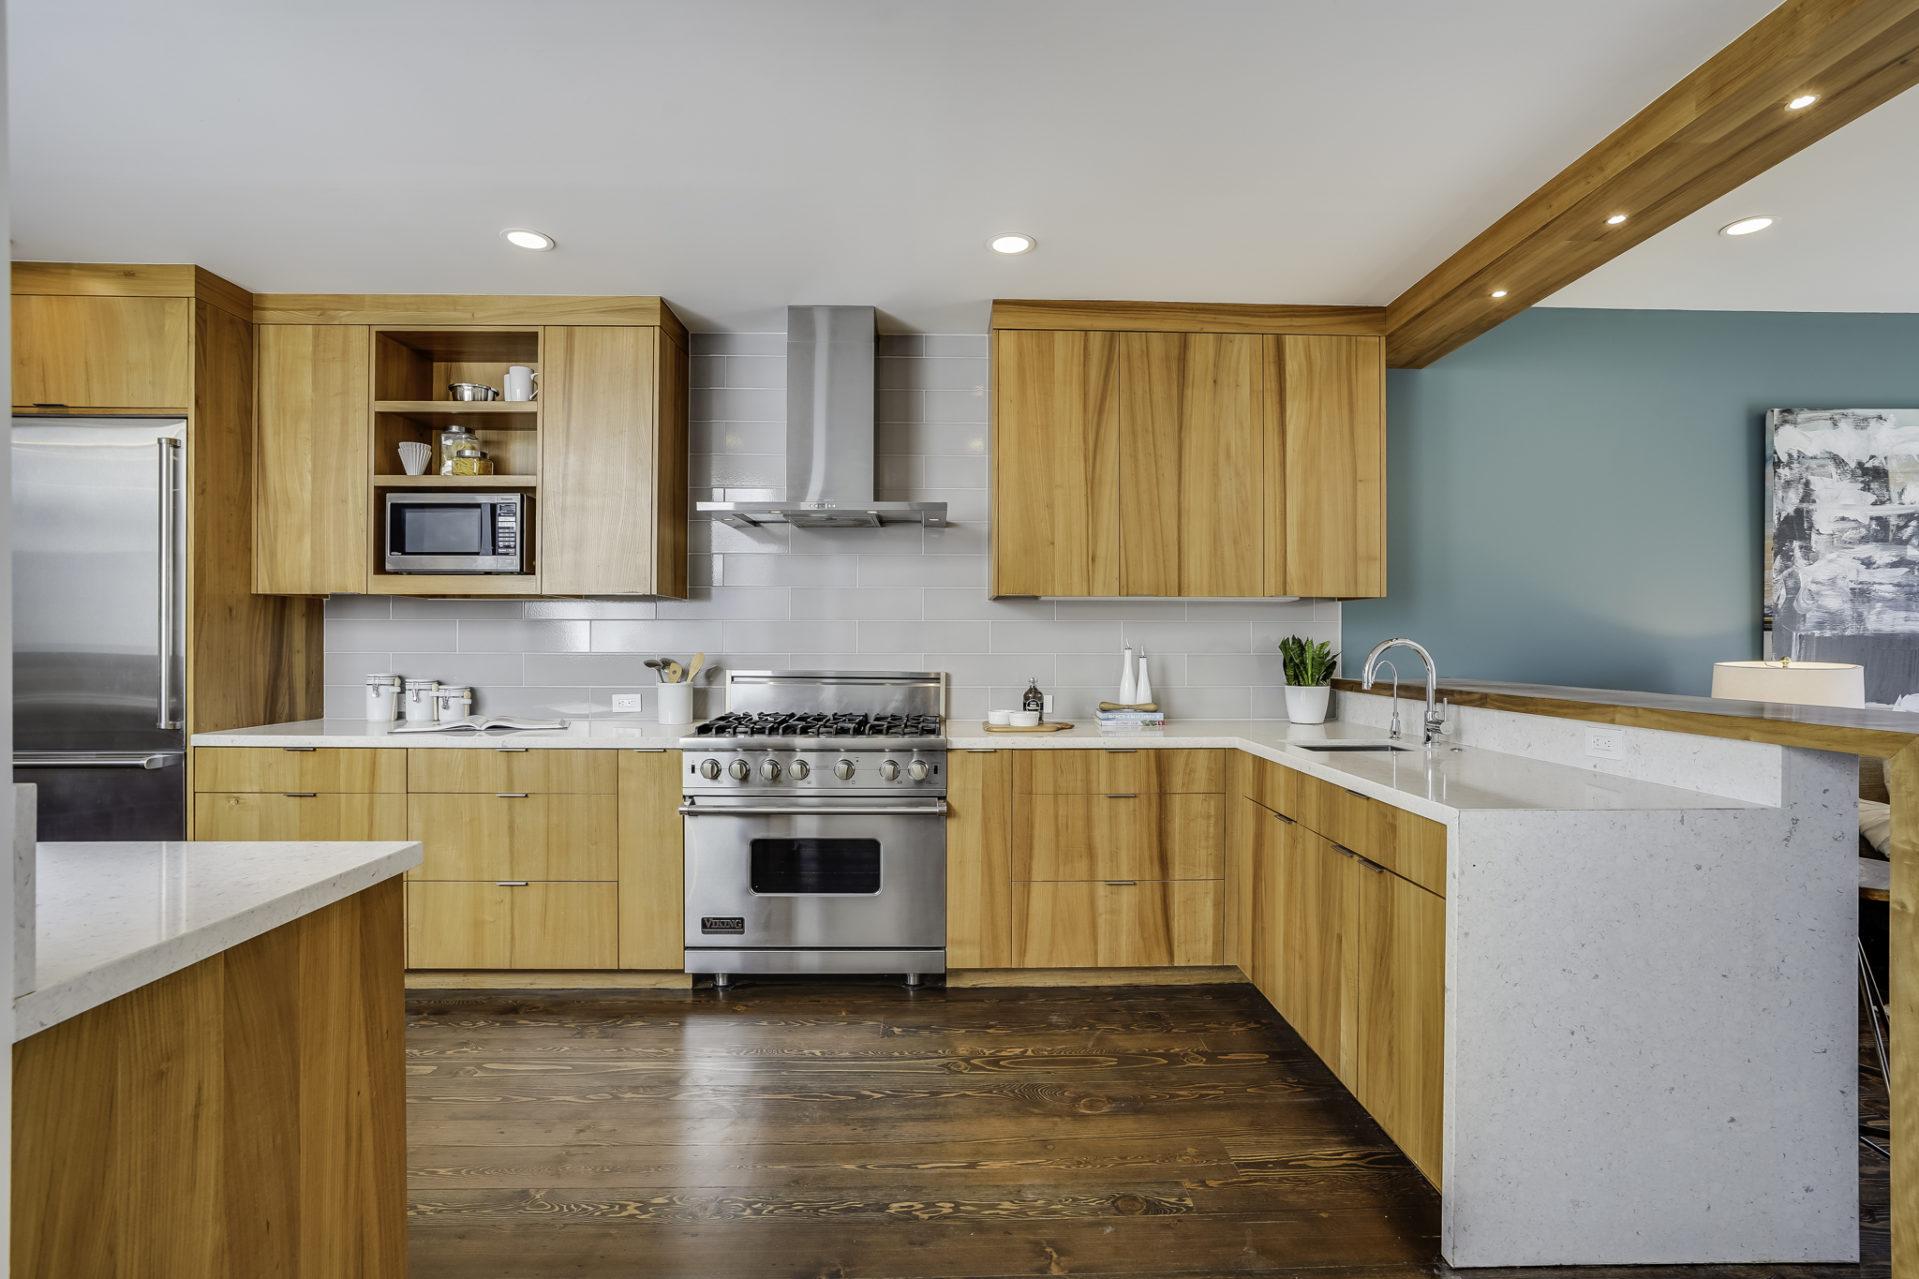 257 29th St. Noe Valley kitchen